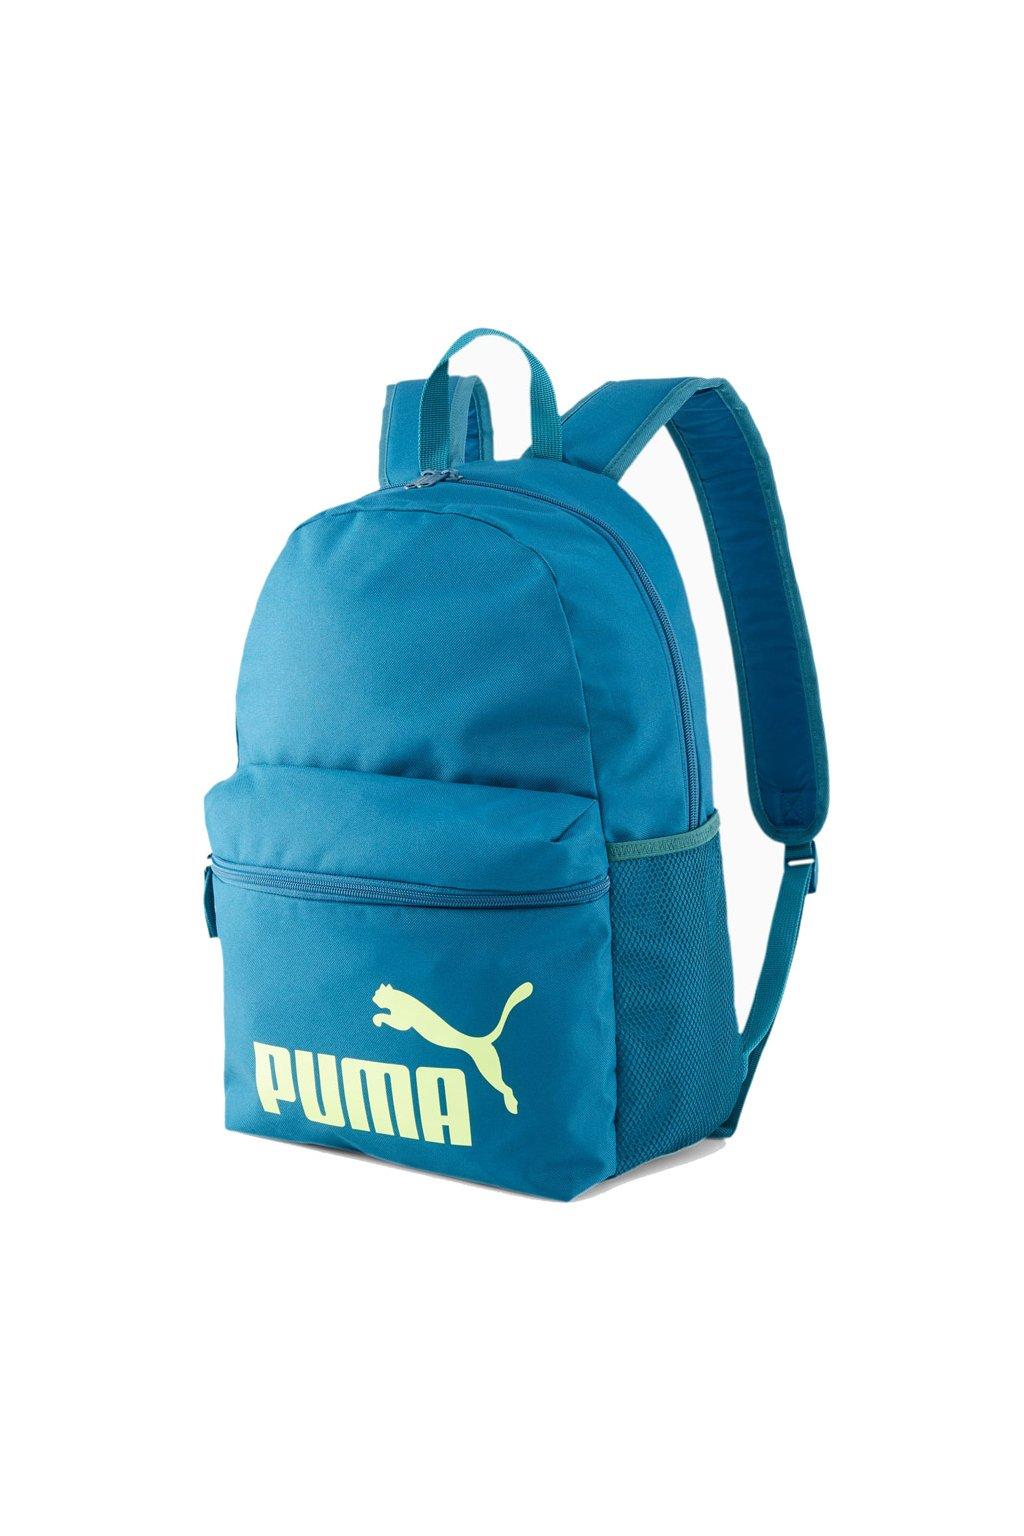 Batoh Puma Phase Backpack modrý 075487 46